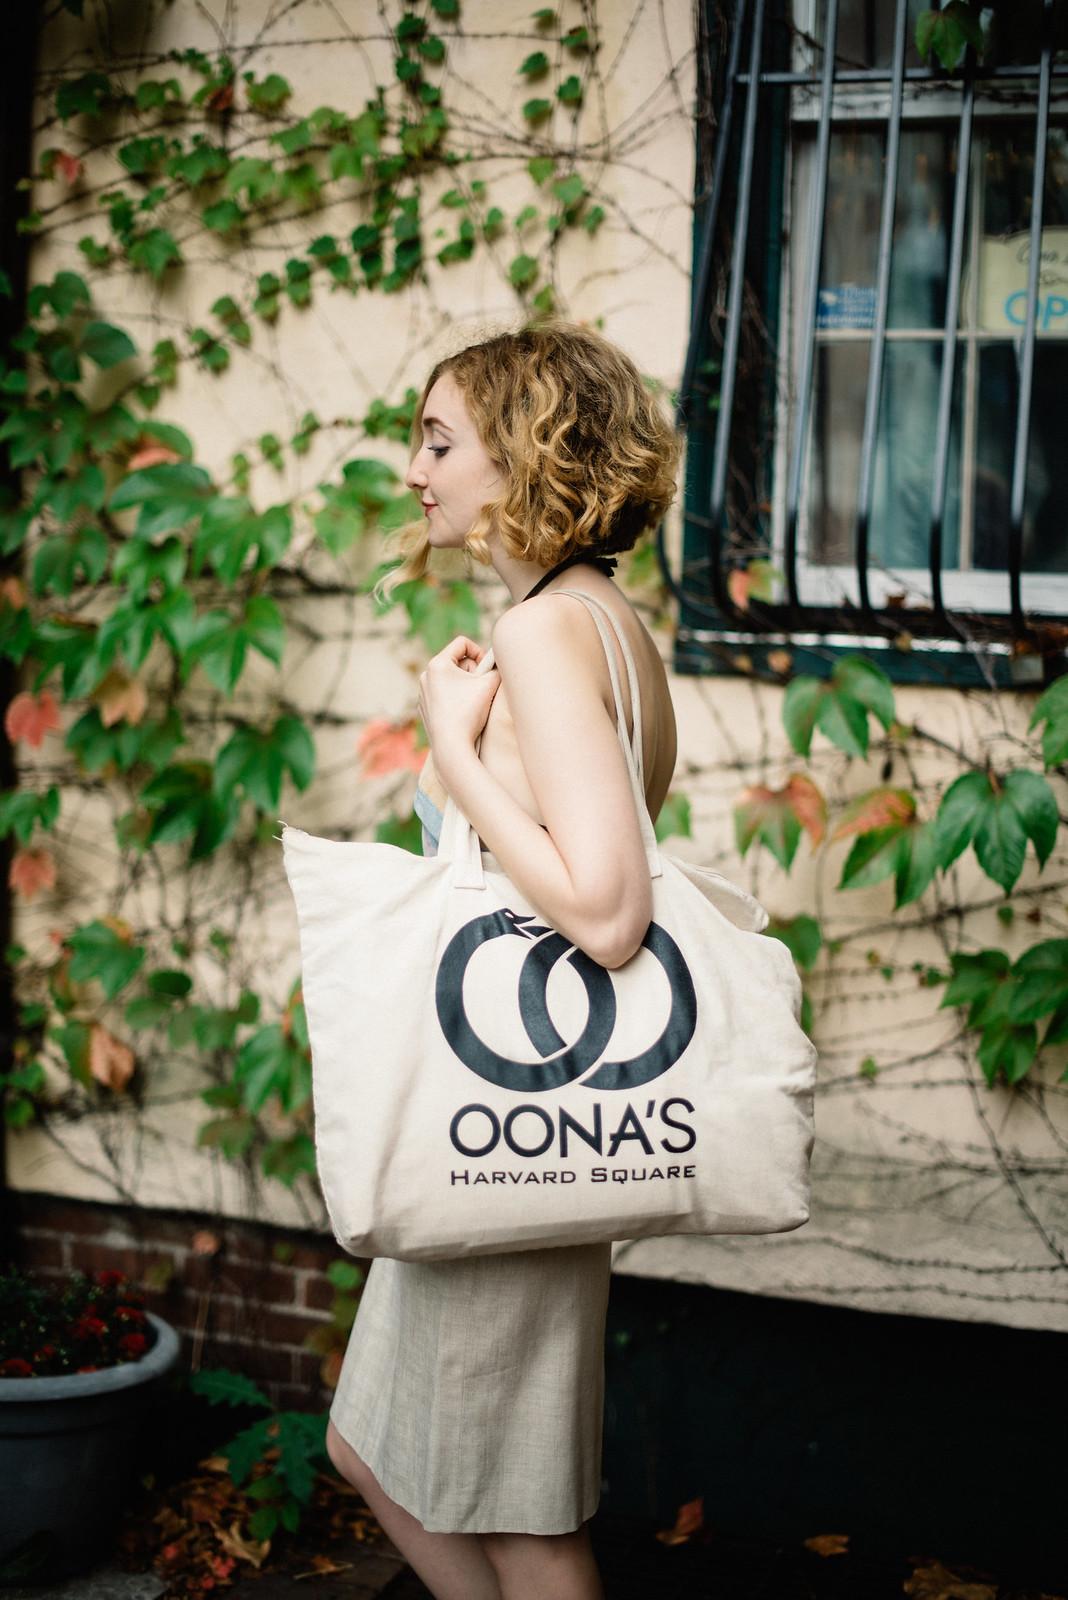 Oonas Lookbook shot by Lauren O'Neil on juliettelaura.blogspot.com